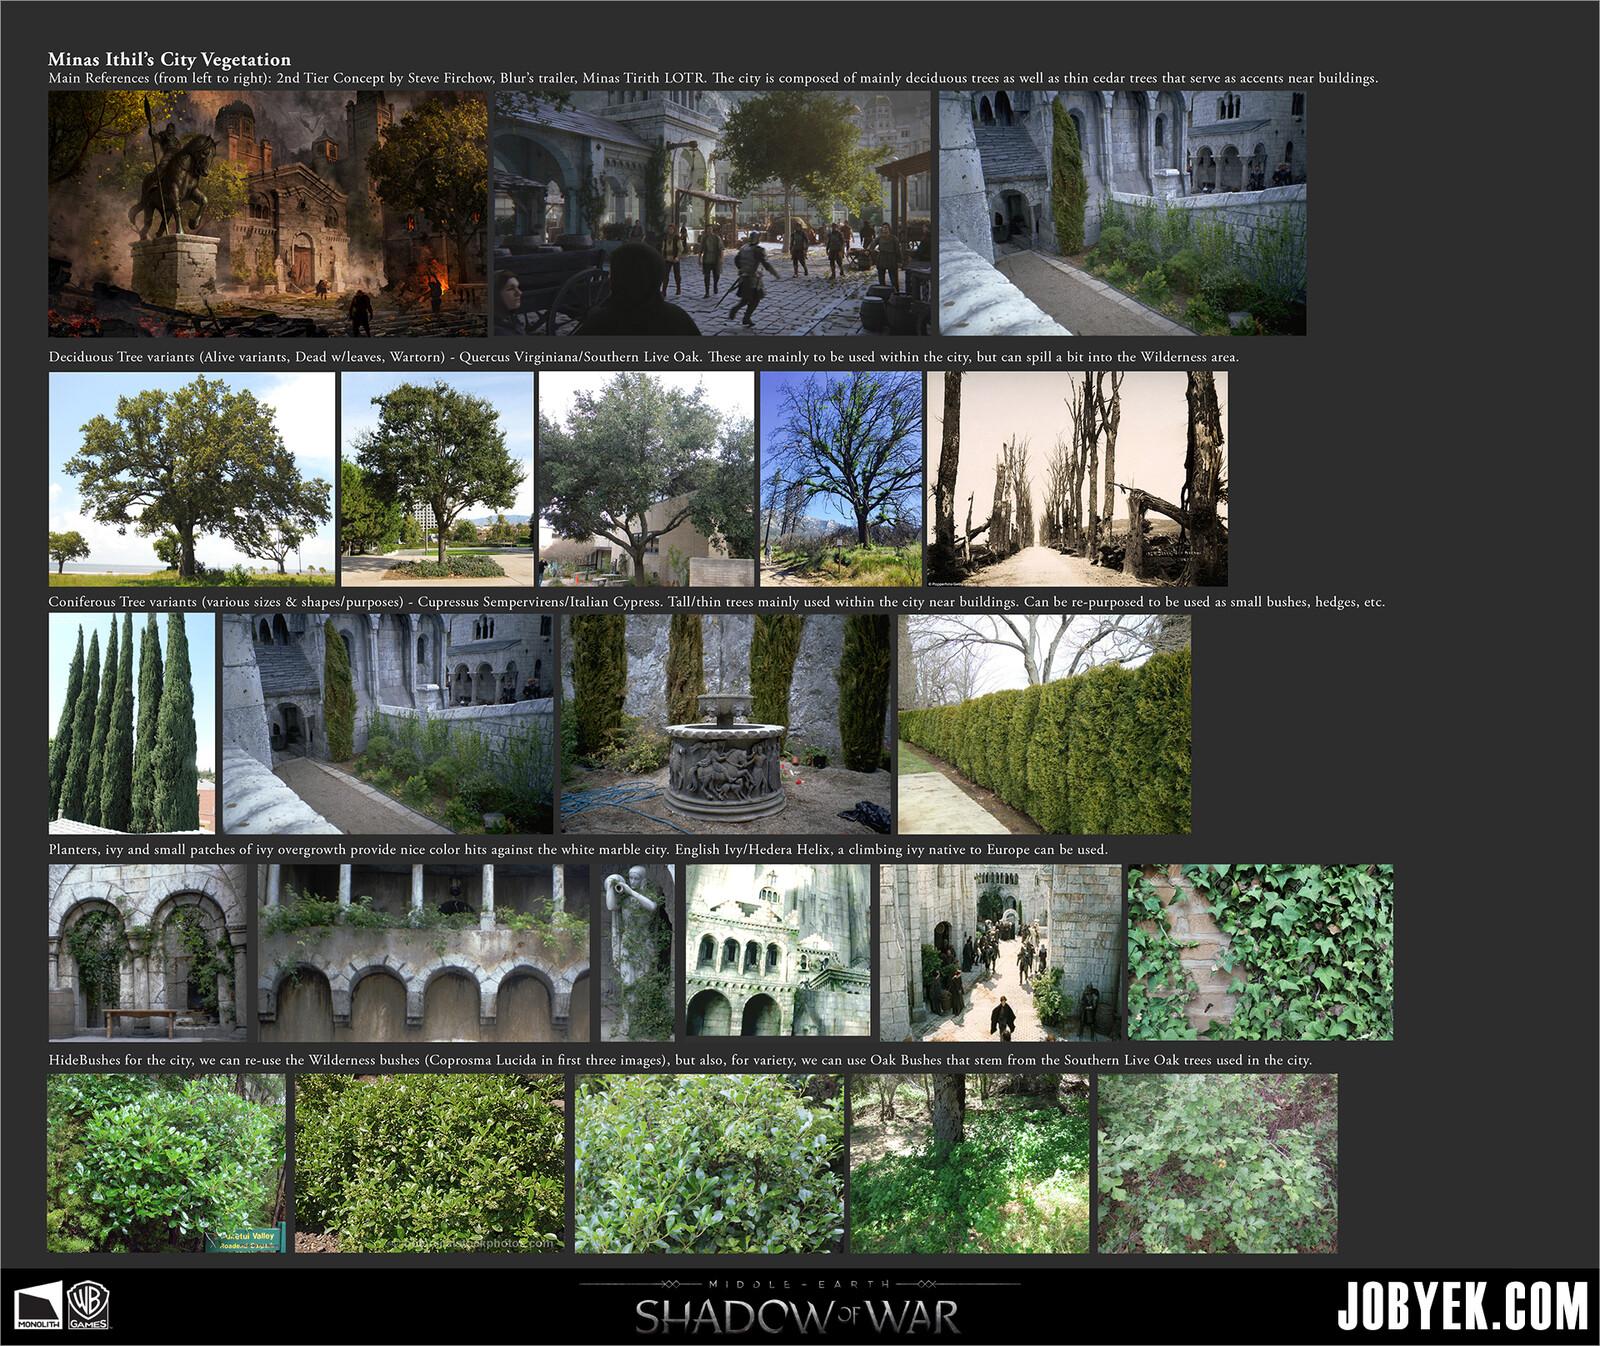 Stylesheet for Minas Ithil's City Vegetation